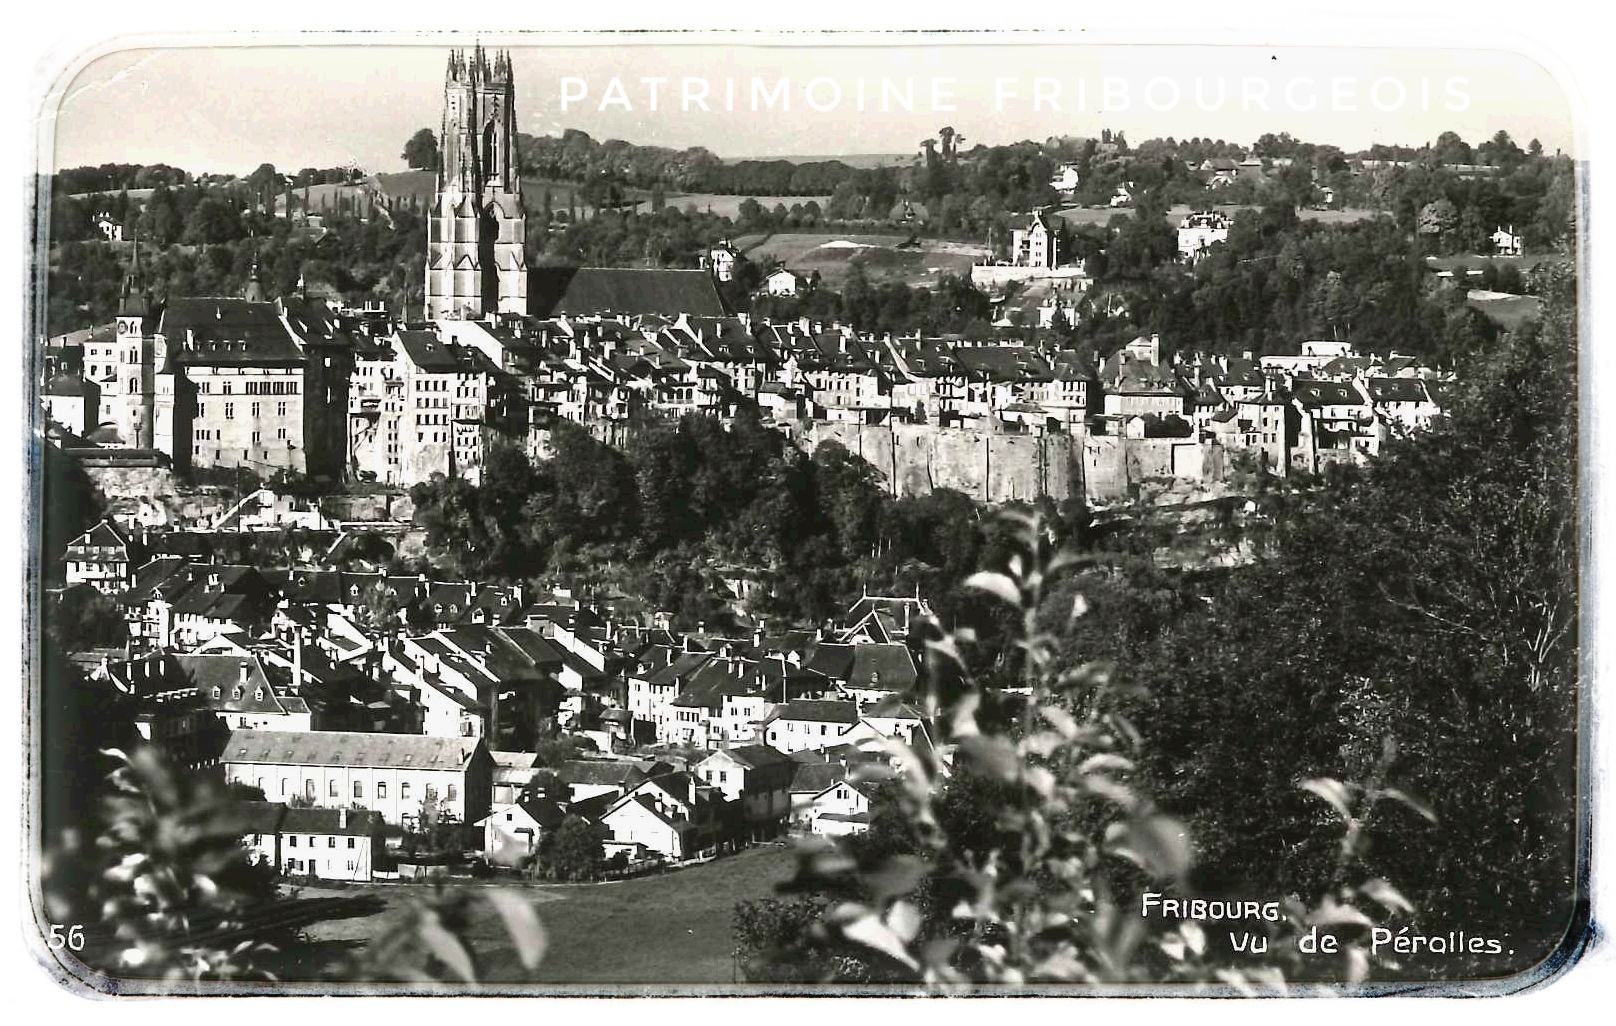 Fribourg vu de Pérolles